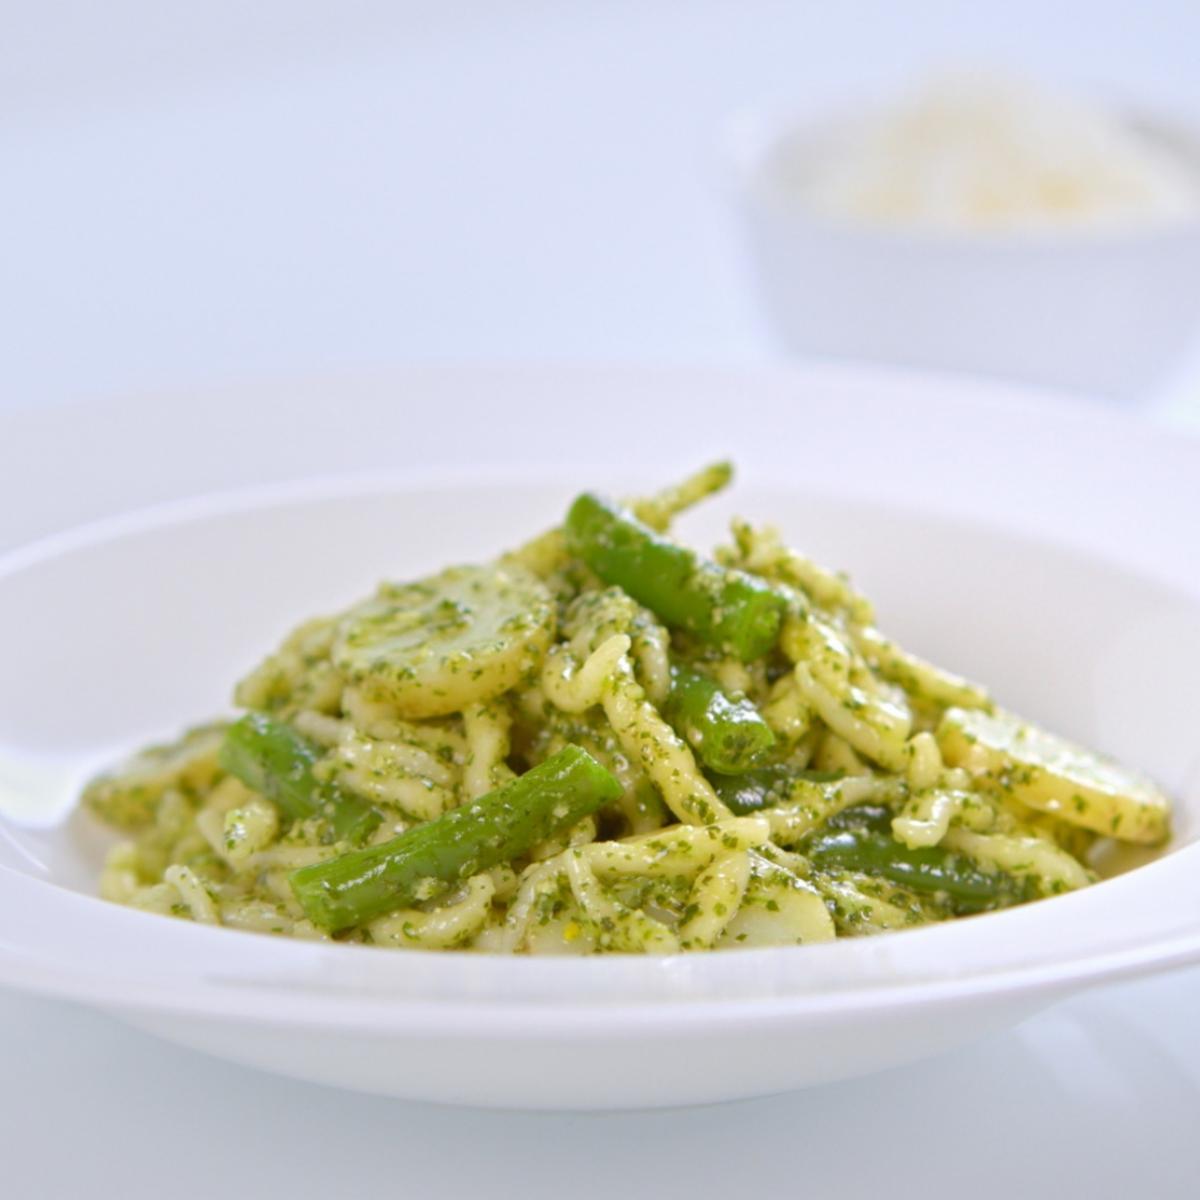 A picture of Delia's Trofie Pasta Liguria (Pasta with Pesto, Potatoes and Green Beans) recipe